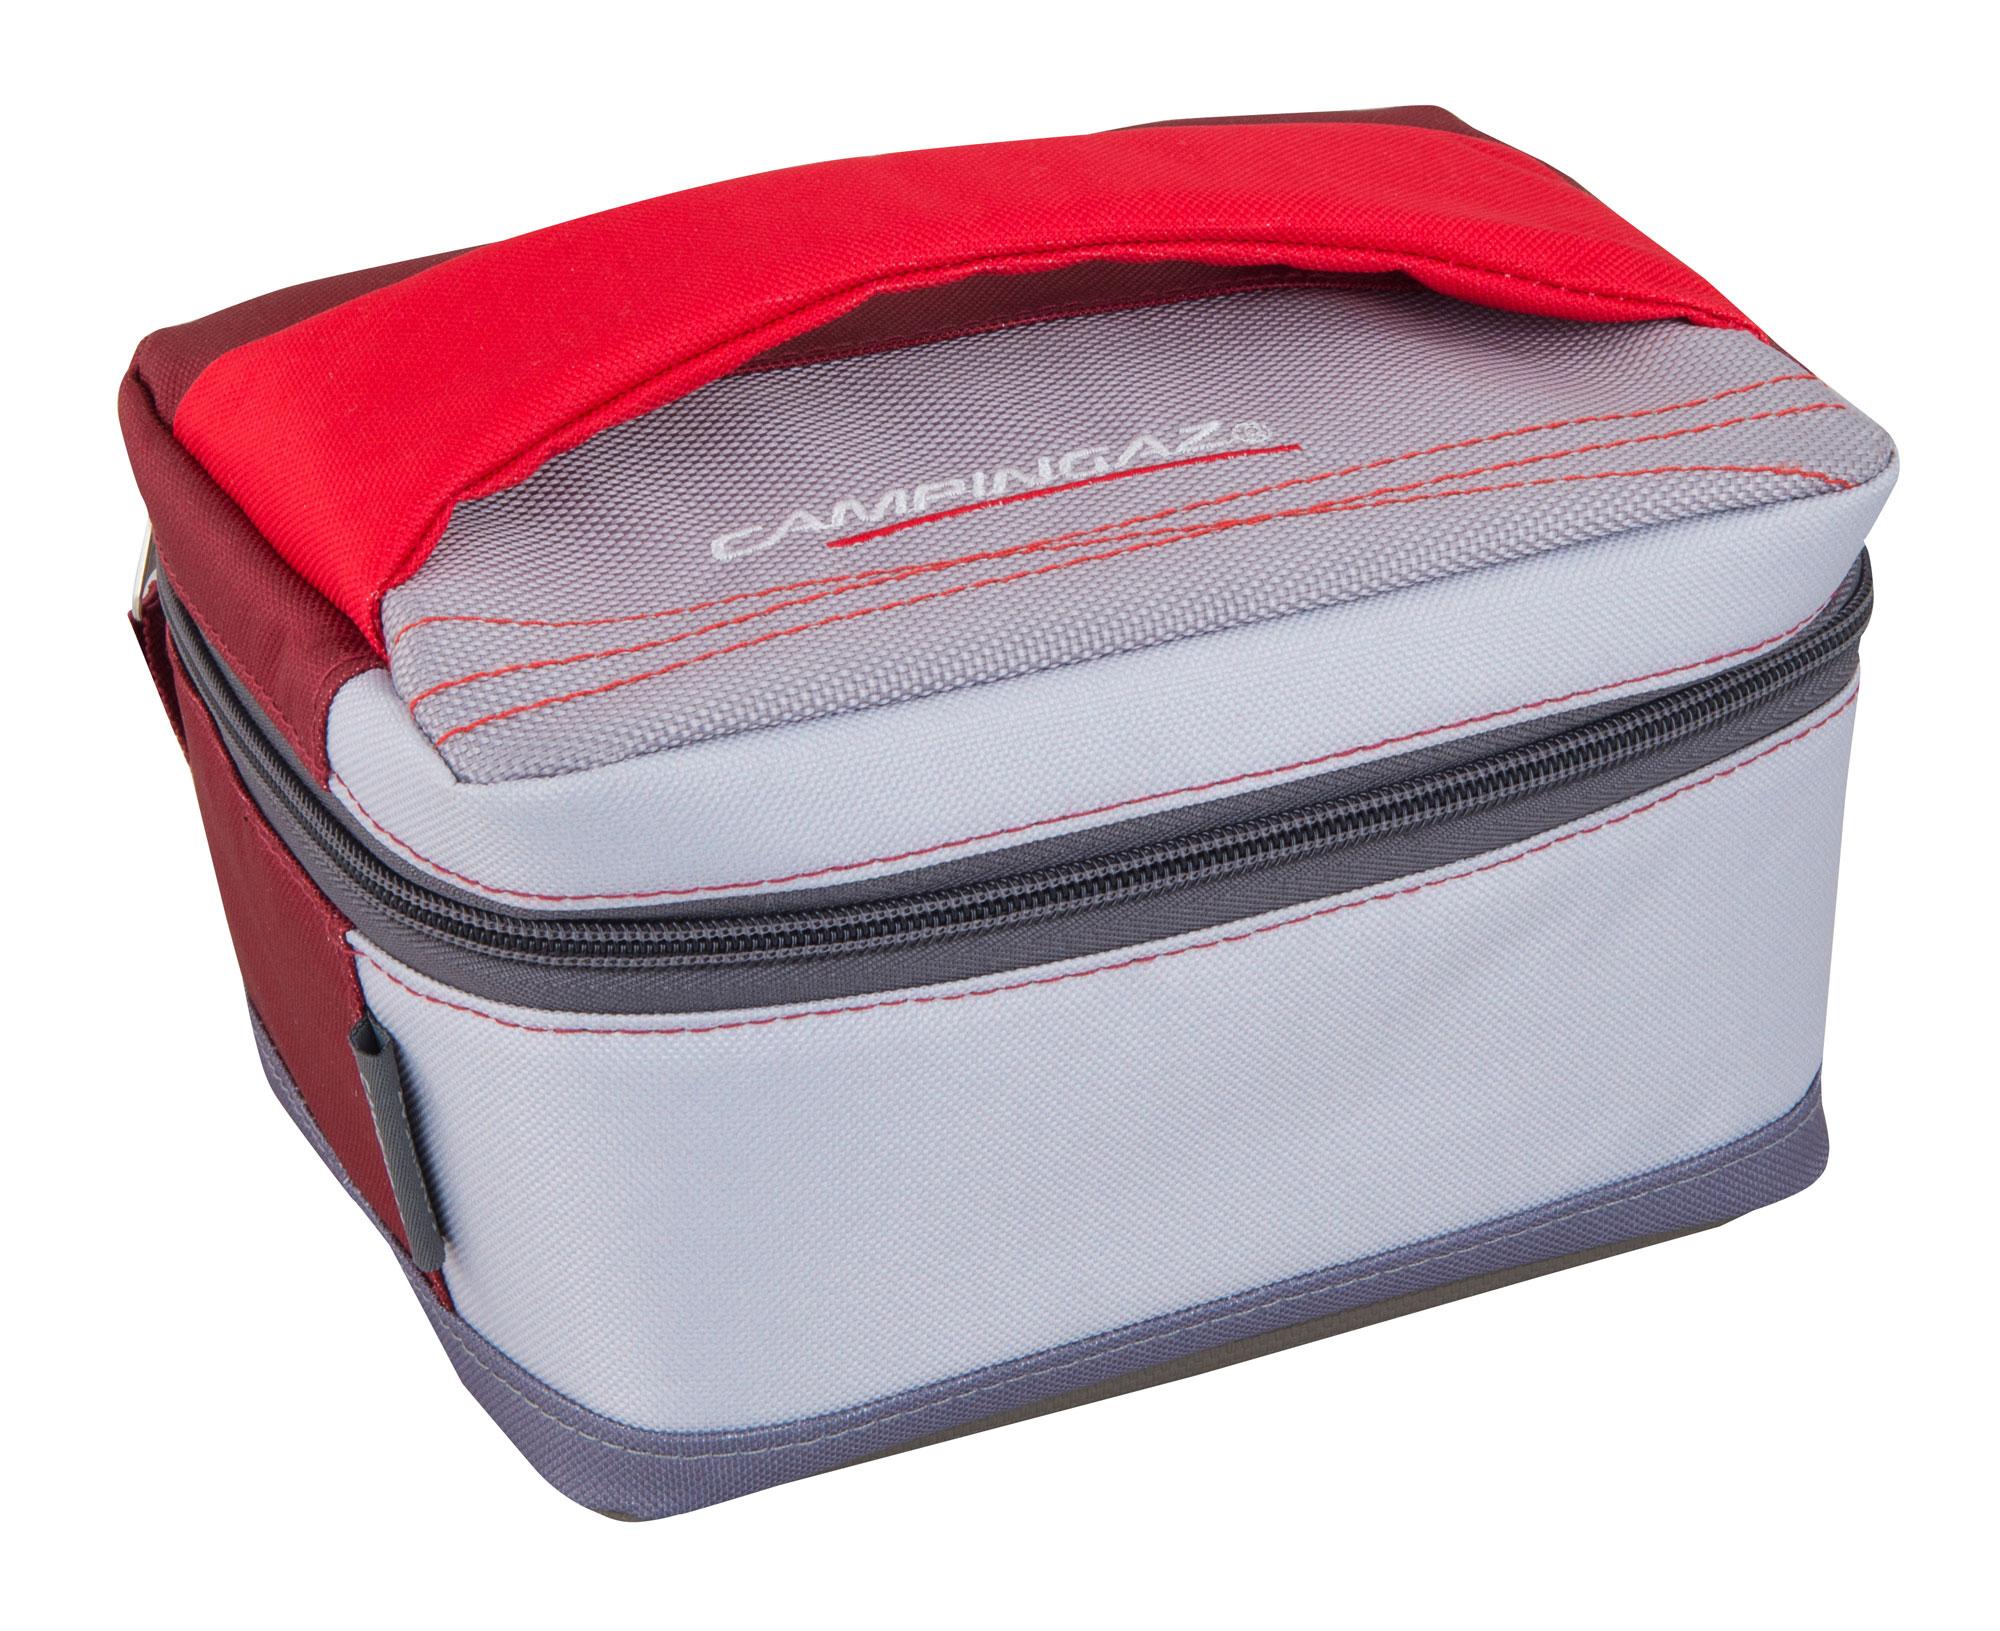 Campingaz Kühltasche Freez'Box (Gr. S) 2 Liter Bild 1